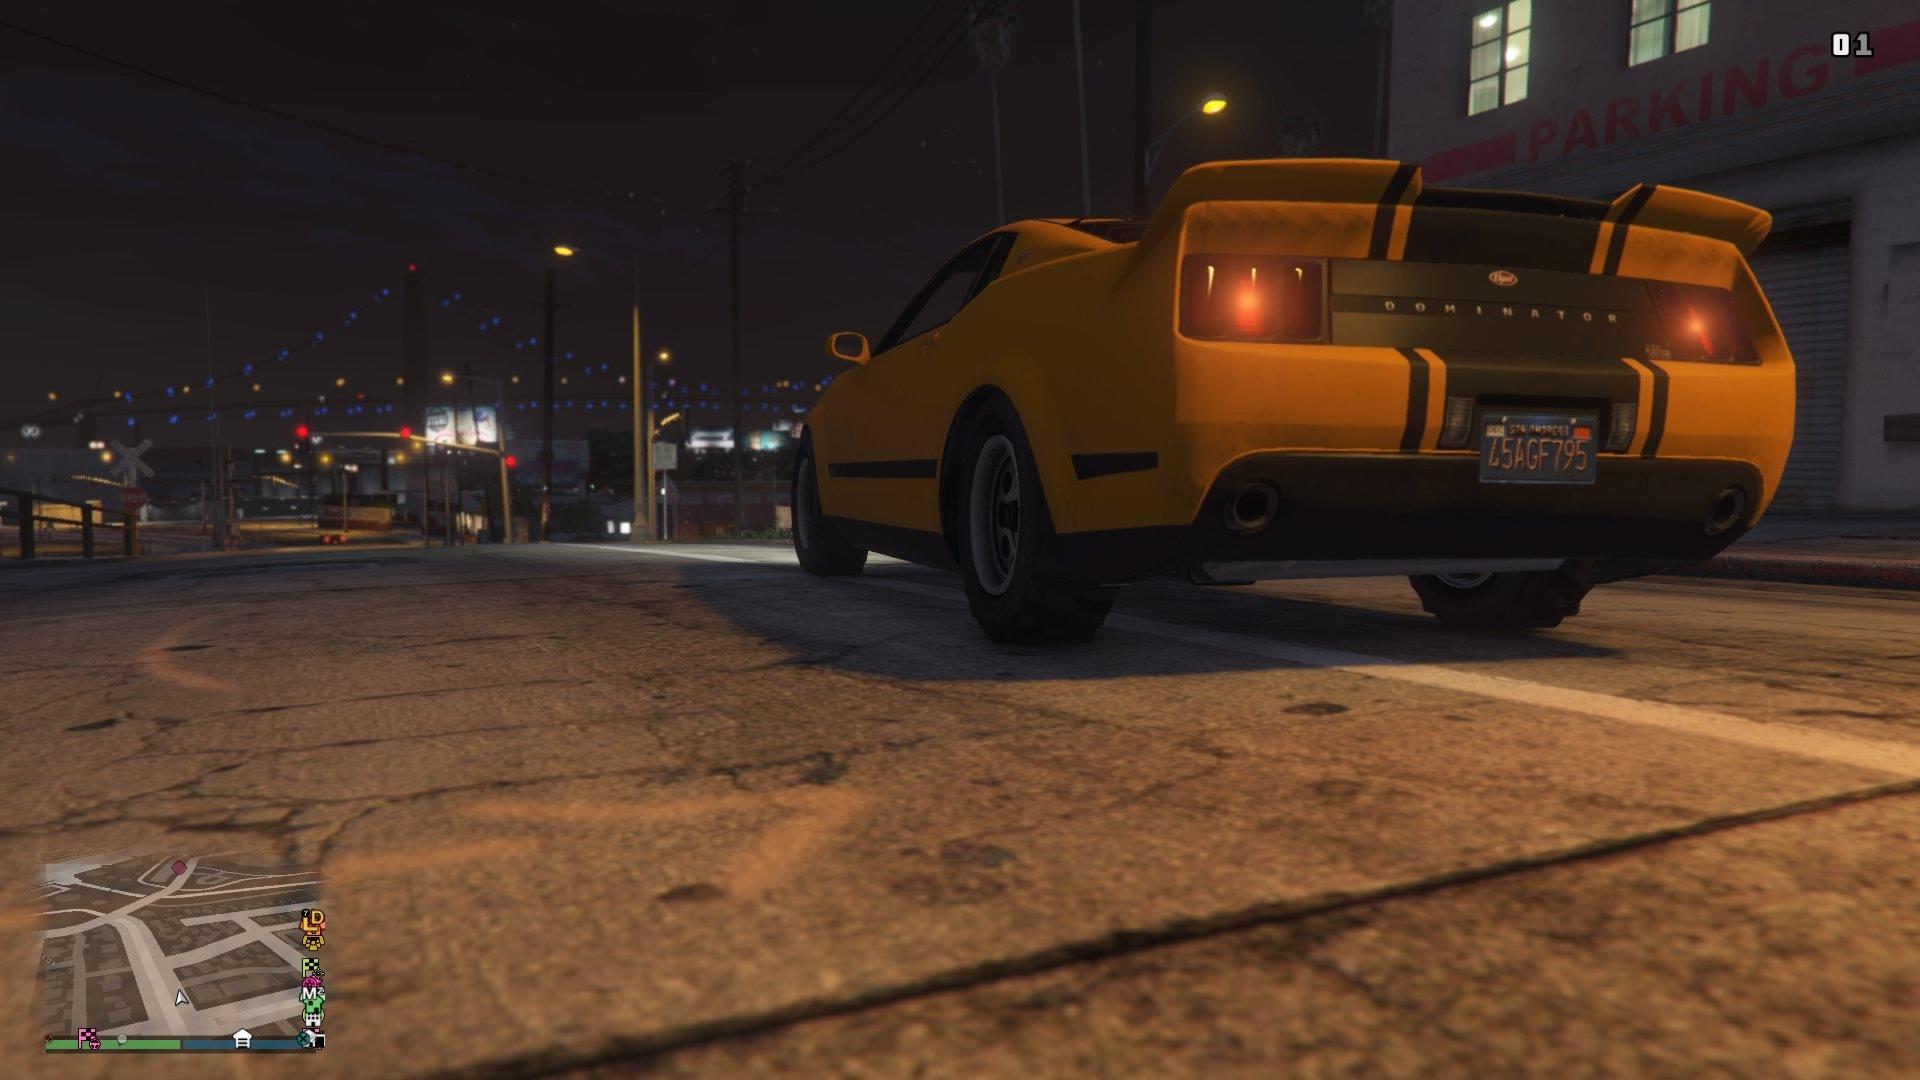 Grand Theft Auto Online Dominator at Night